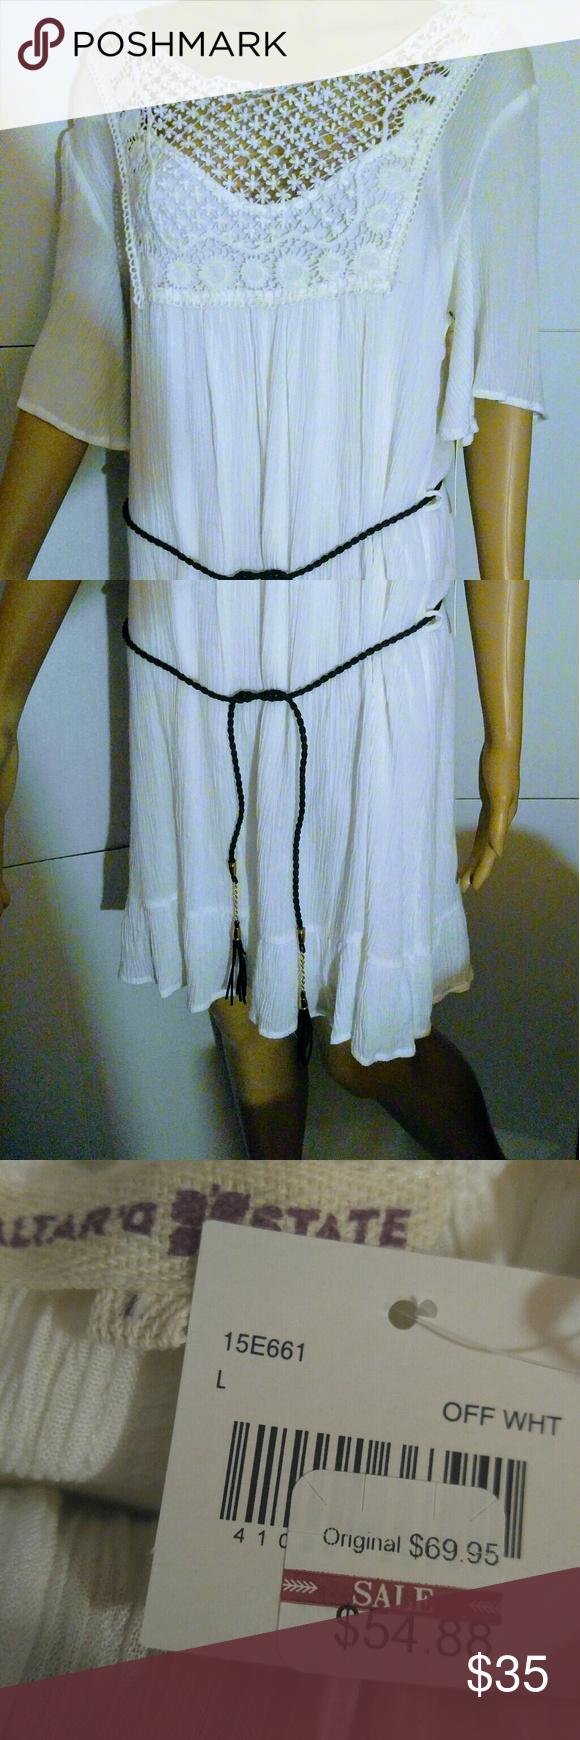 Nwt womenus dress altarud state mini white size l mini length cutout